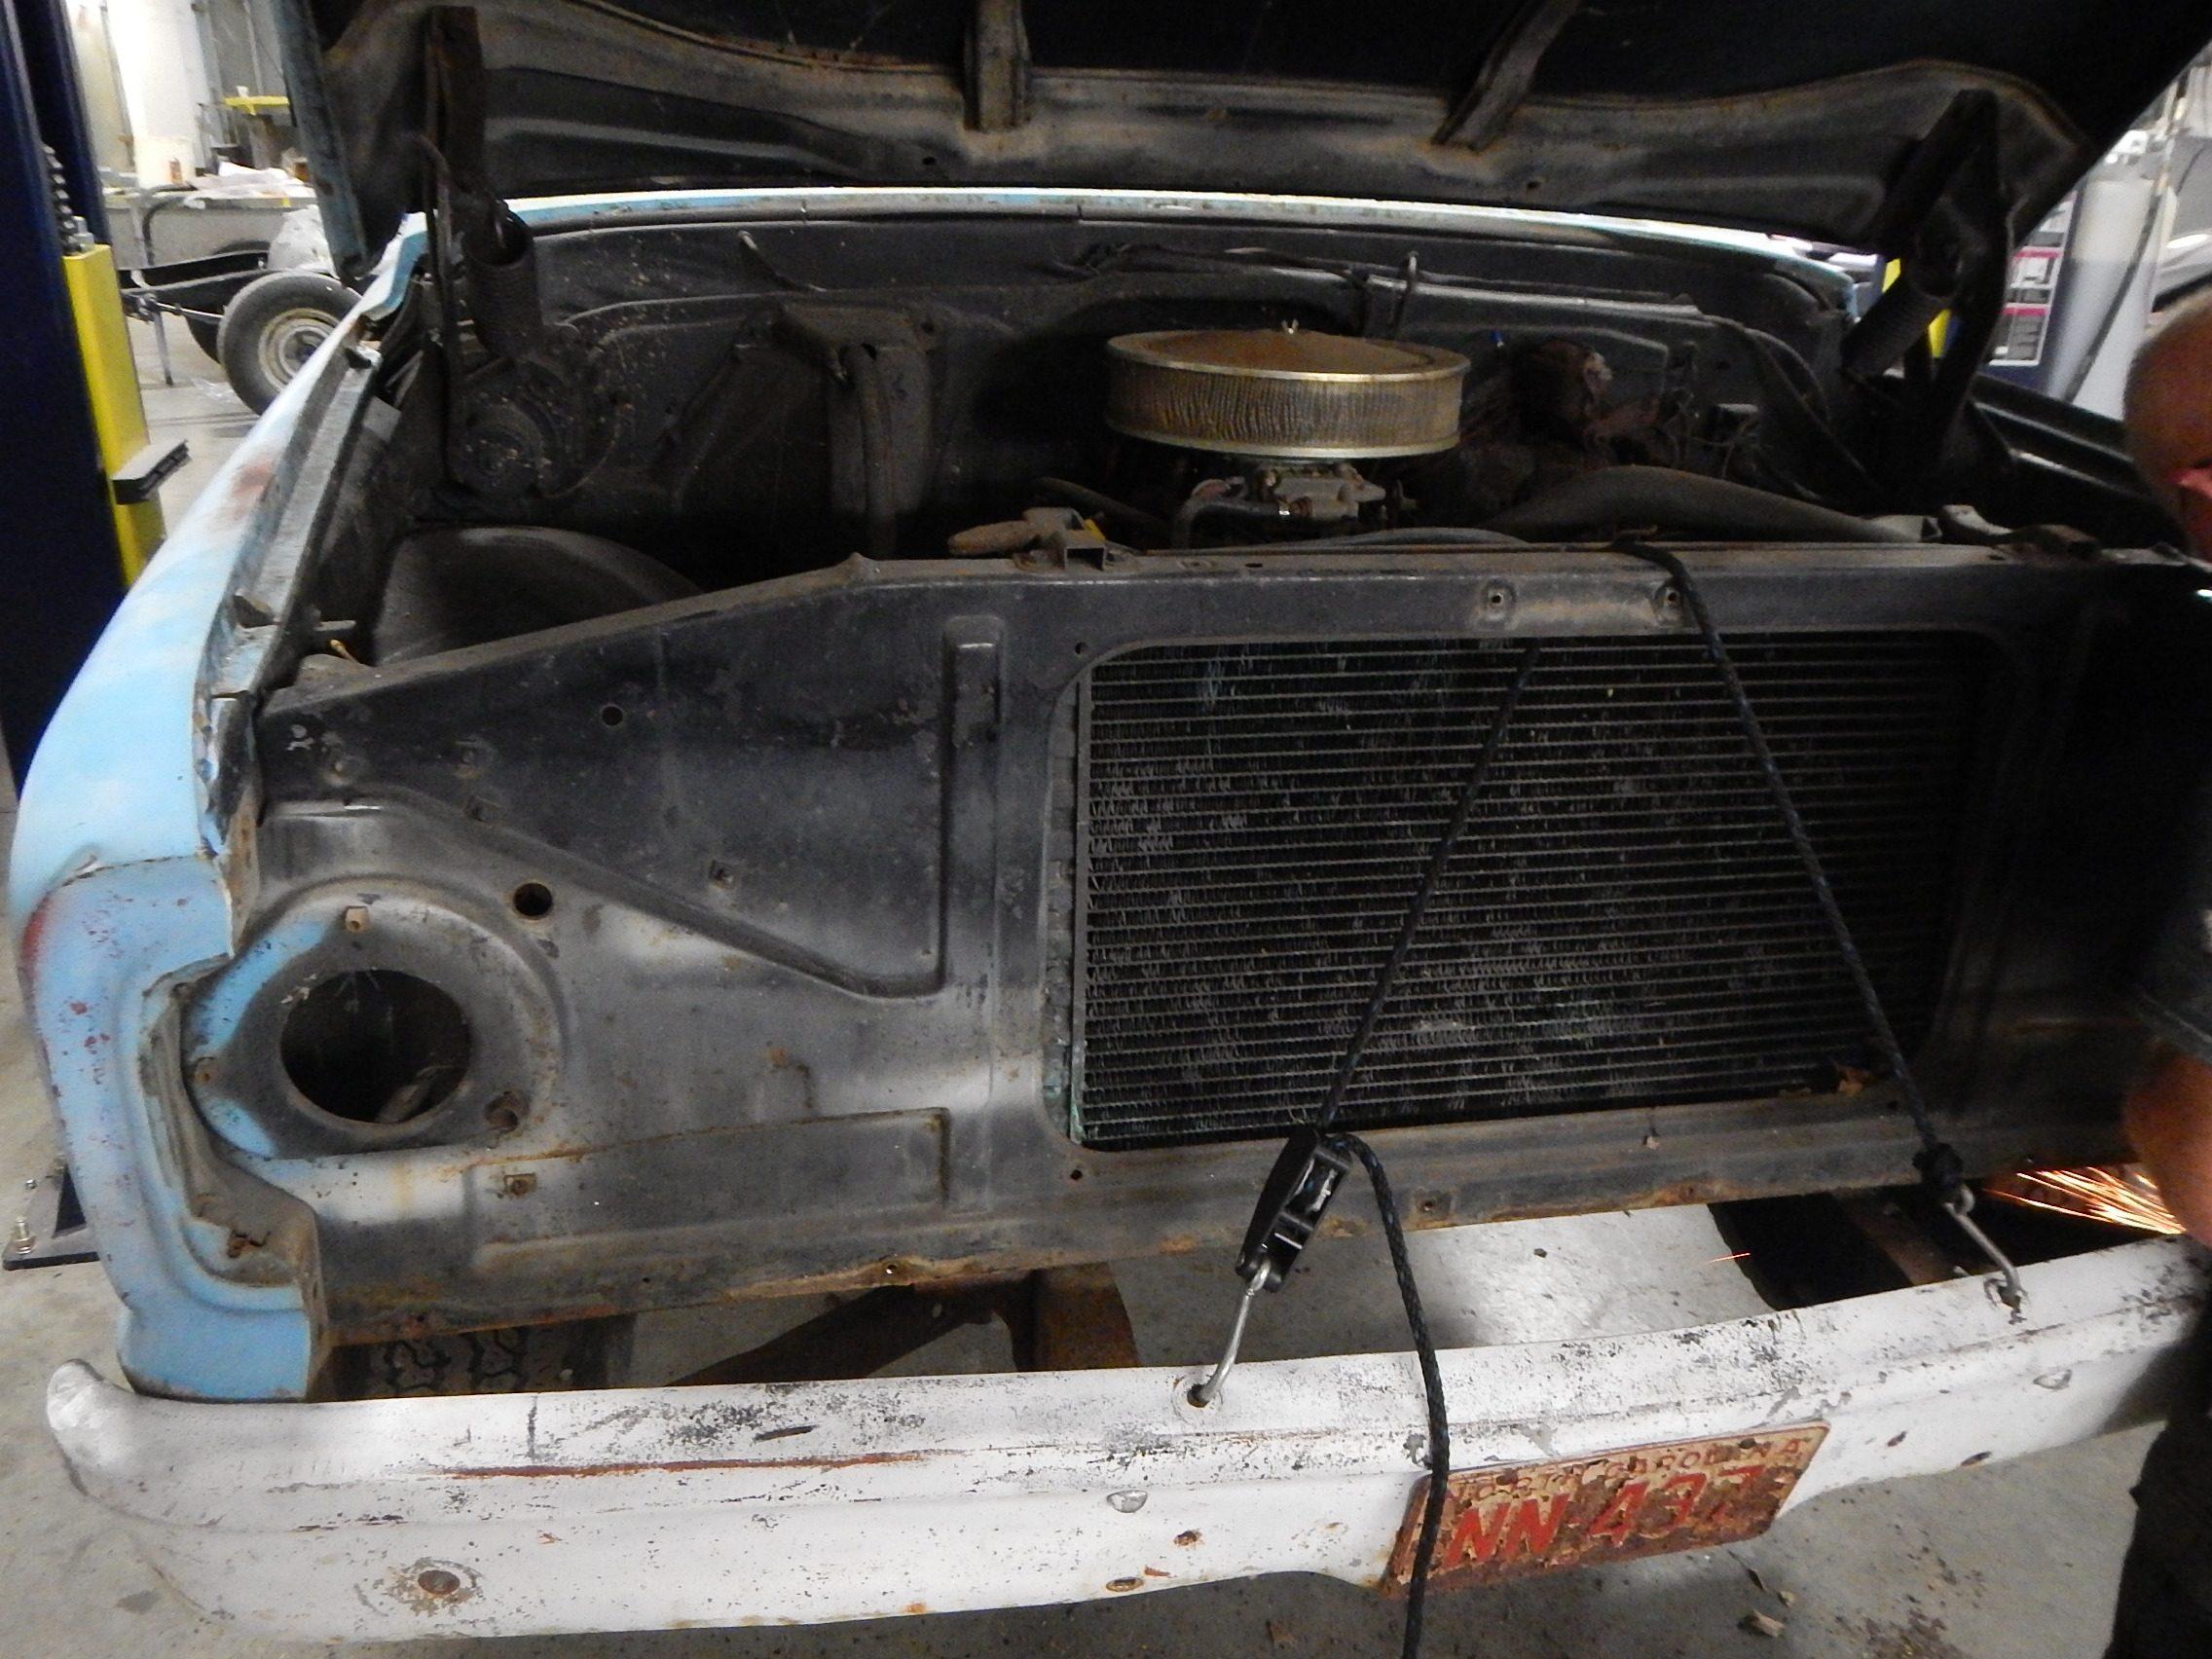 1967 Chevy C-10 restoration 03.jpg